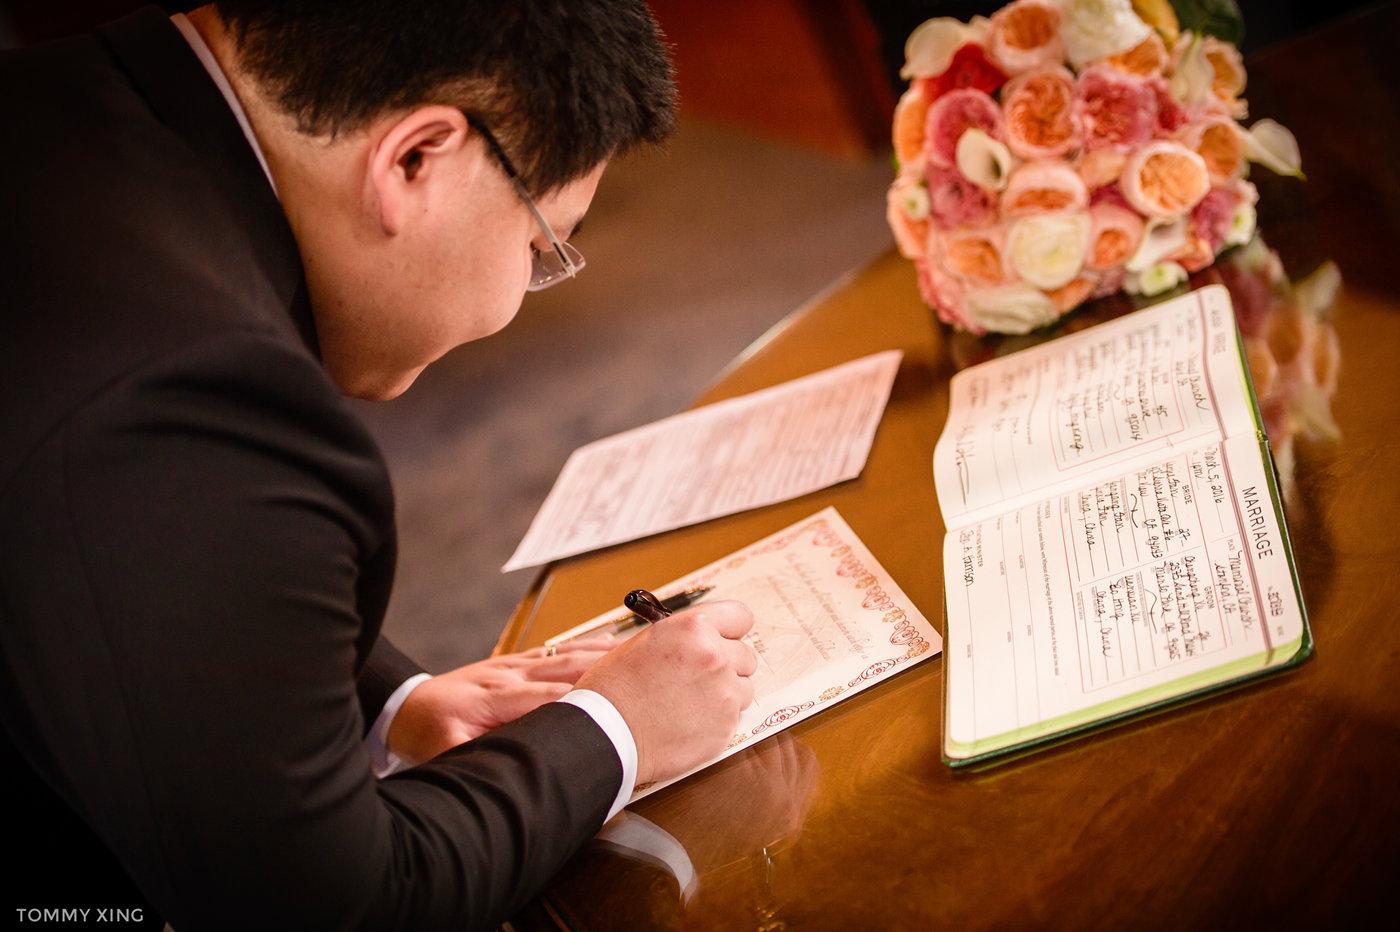 STANFORD MEMORIAL CHURCH WEDDING - Wenjie & Chengcheng - SAN FRANCISCO BAY AREA 斯坦福教堂婚礼跟拍 - 洛杉矶婚礼婚纱照摄影师 Tommy Xing Photography128.jpg